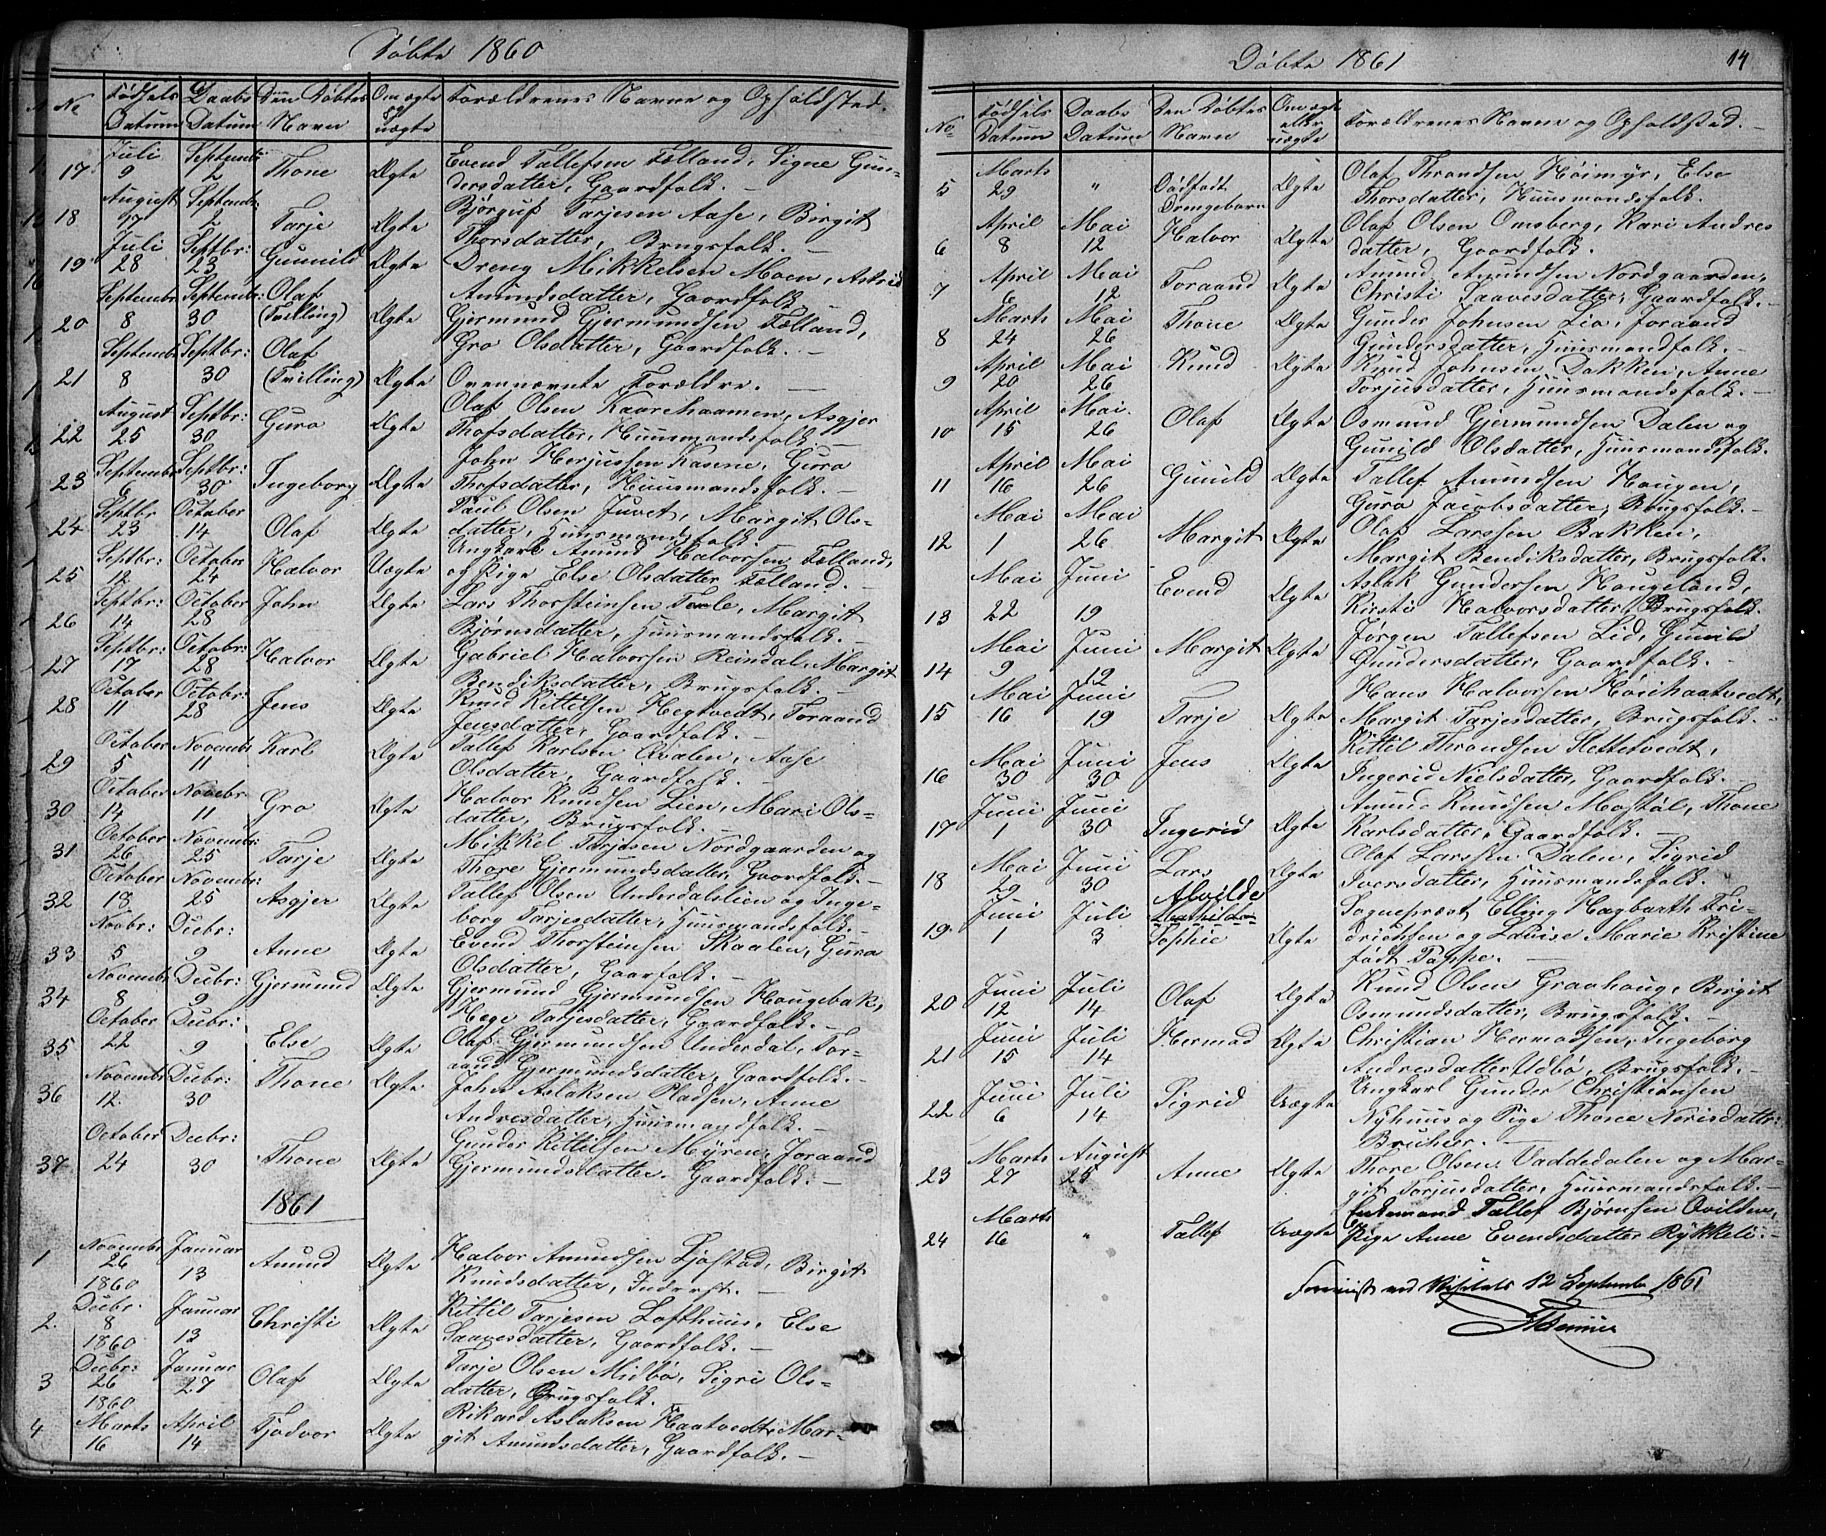 SAKO, Mo kirkebøker, G/Ga/L0001: Klokkerbok nr. I 1, 1851-1891, s. 14